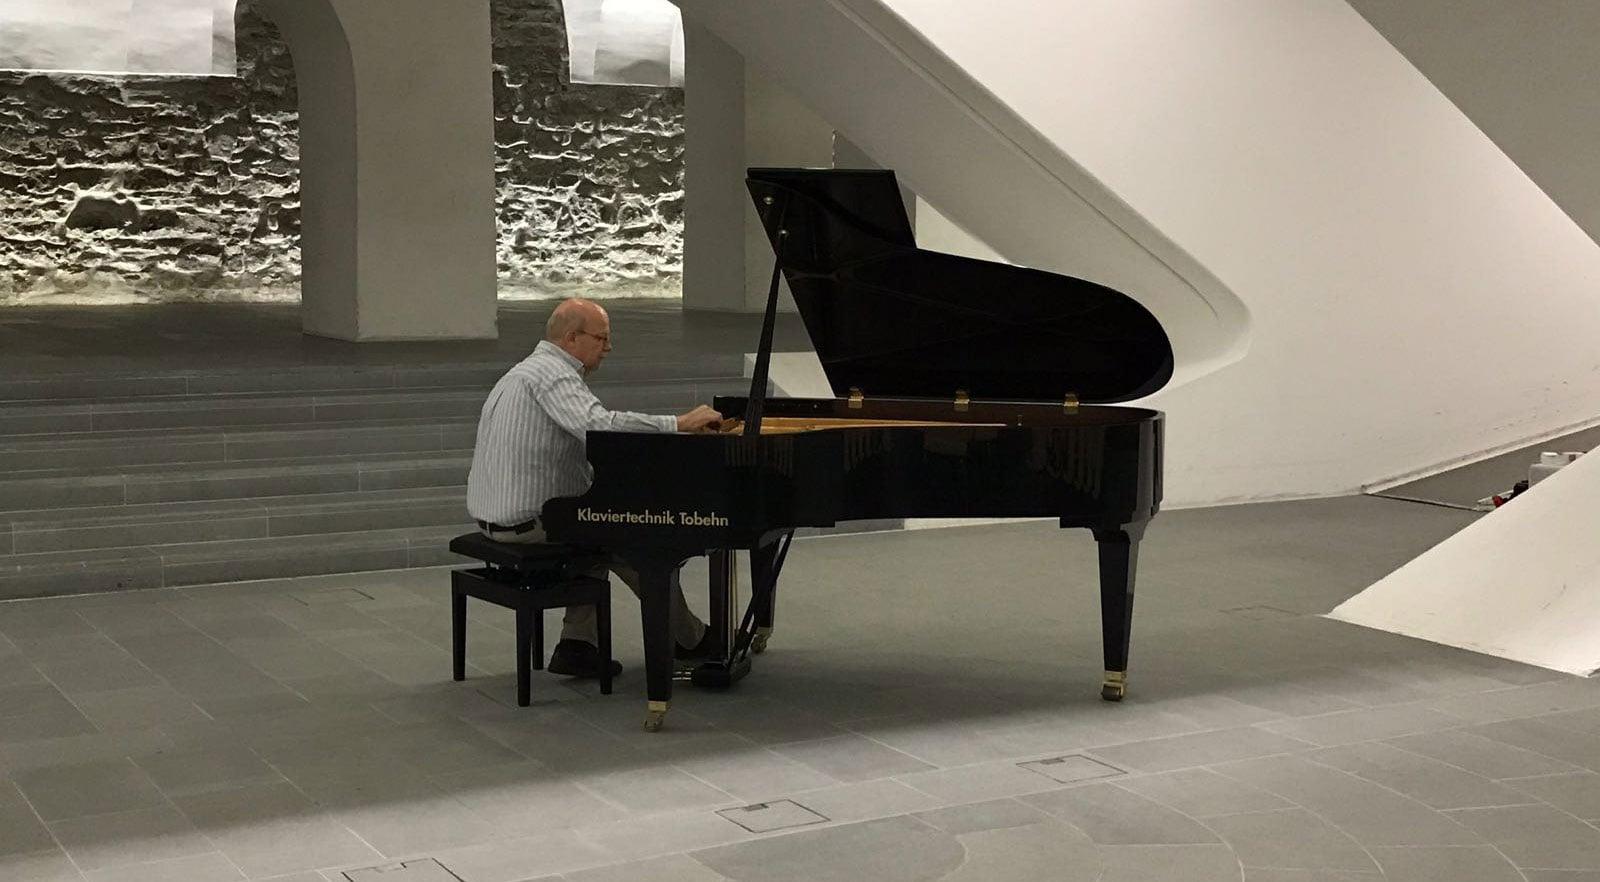 Klavier Reparaturen & Stimmservice in der Schweiz - Klaviertechnik Tobehn